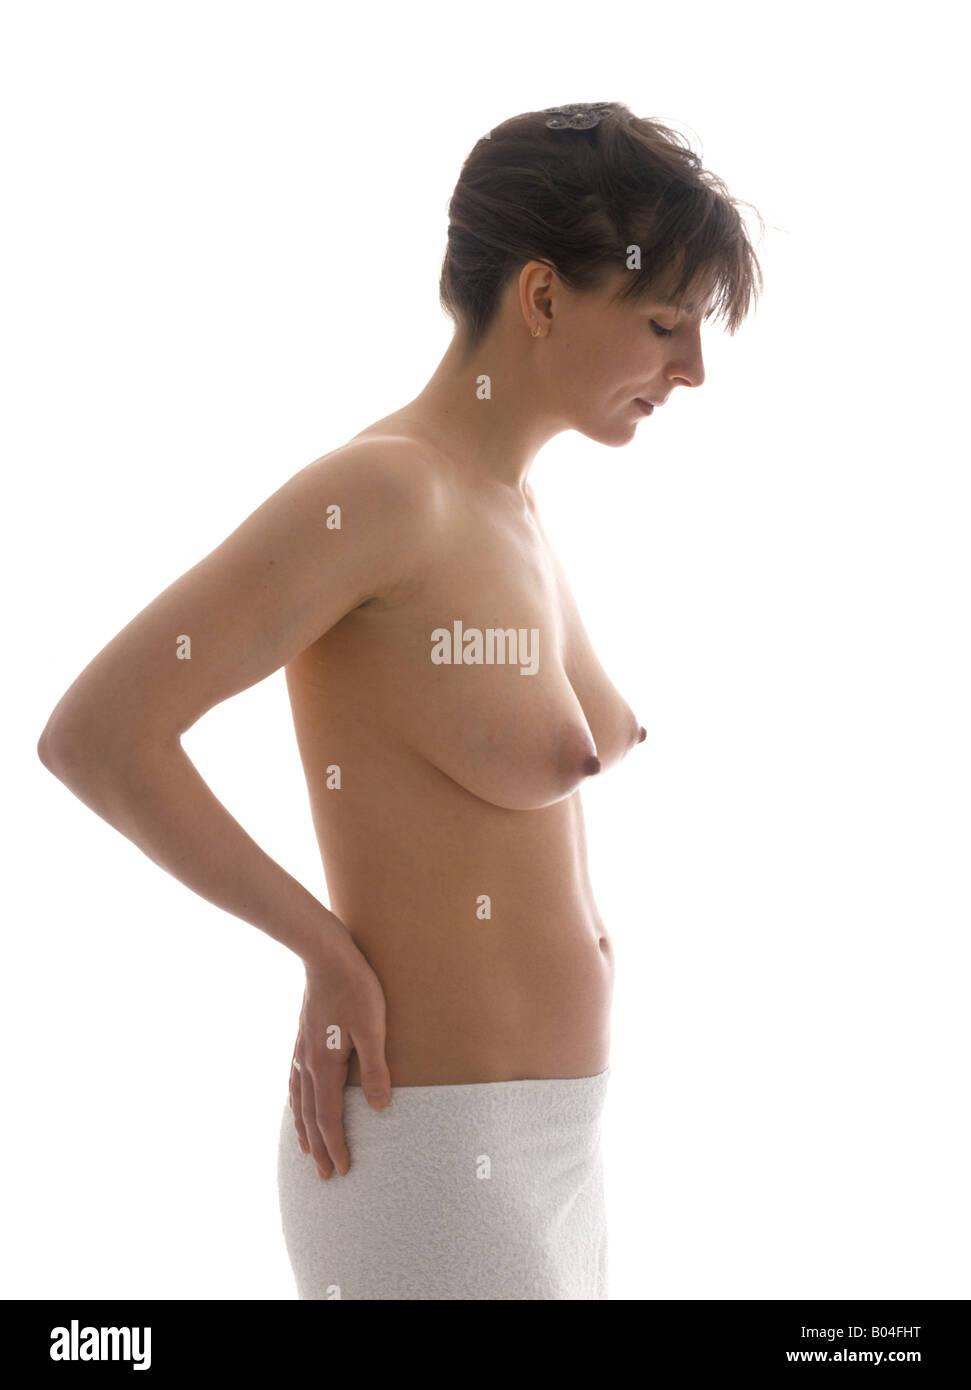 Nude Pregnancy Photo 99